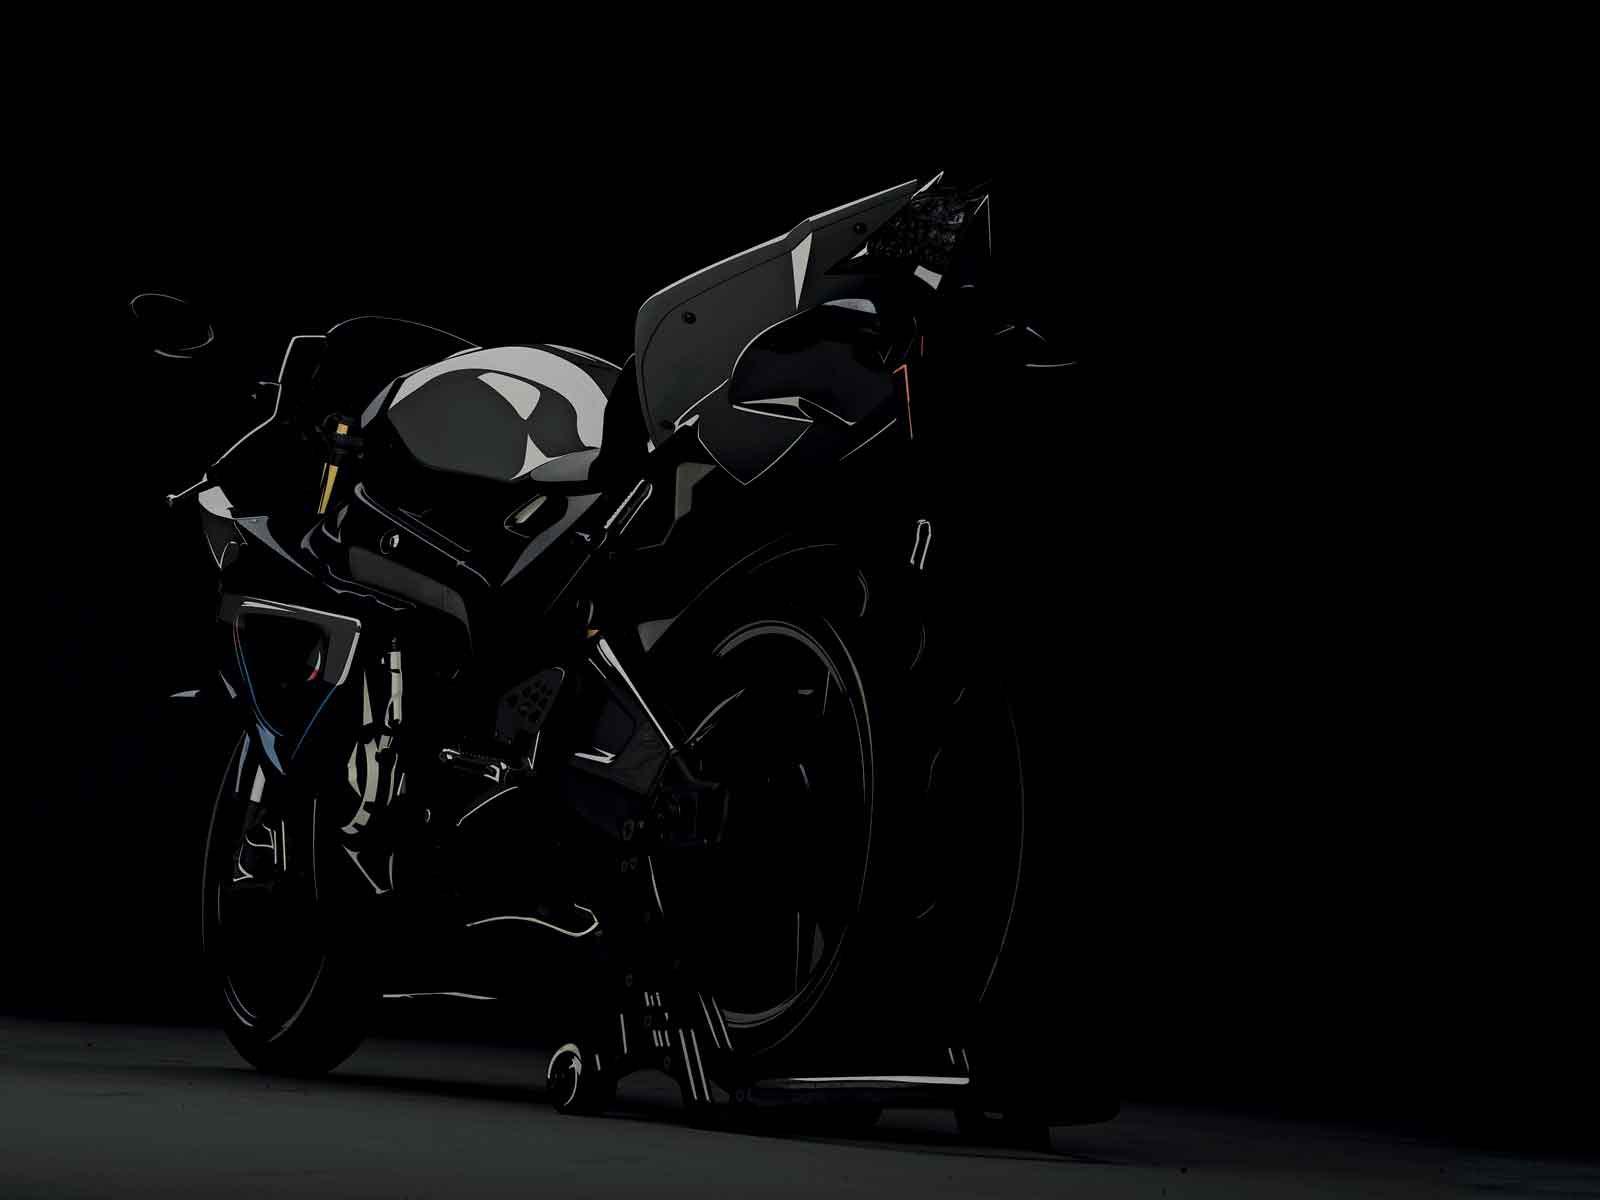 2010 Bmw S1000rr Wallpaper Motorcyclist